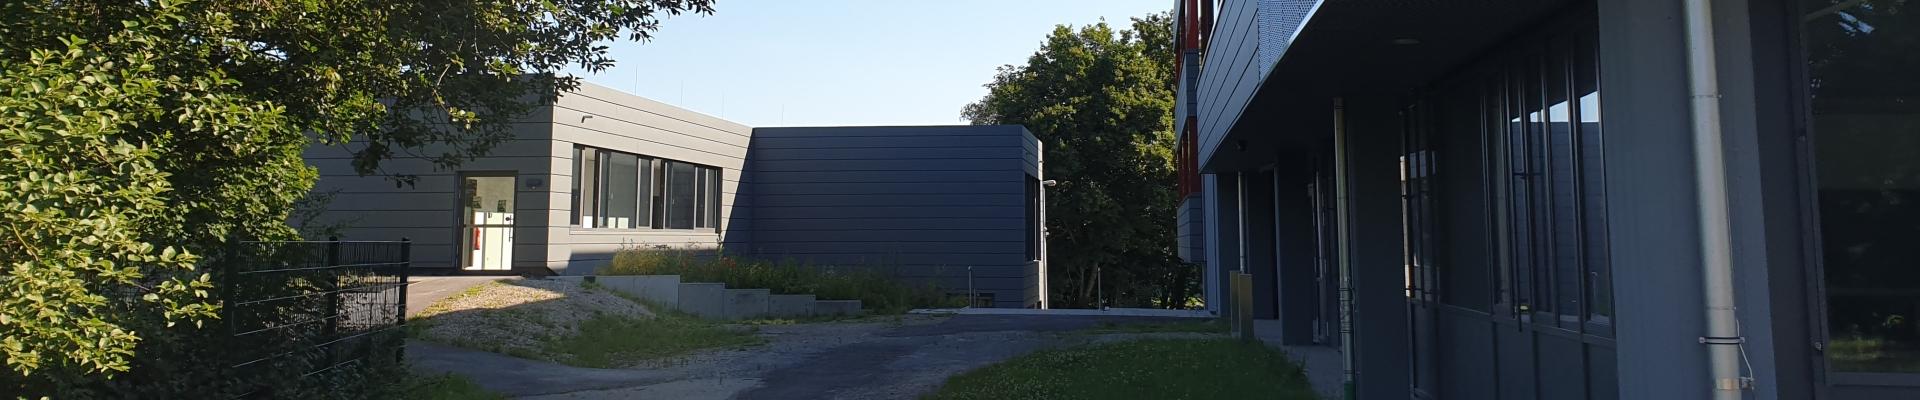 Felix-Fechenbach-Gesamtschule Leopoldshöhe